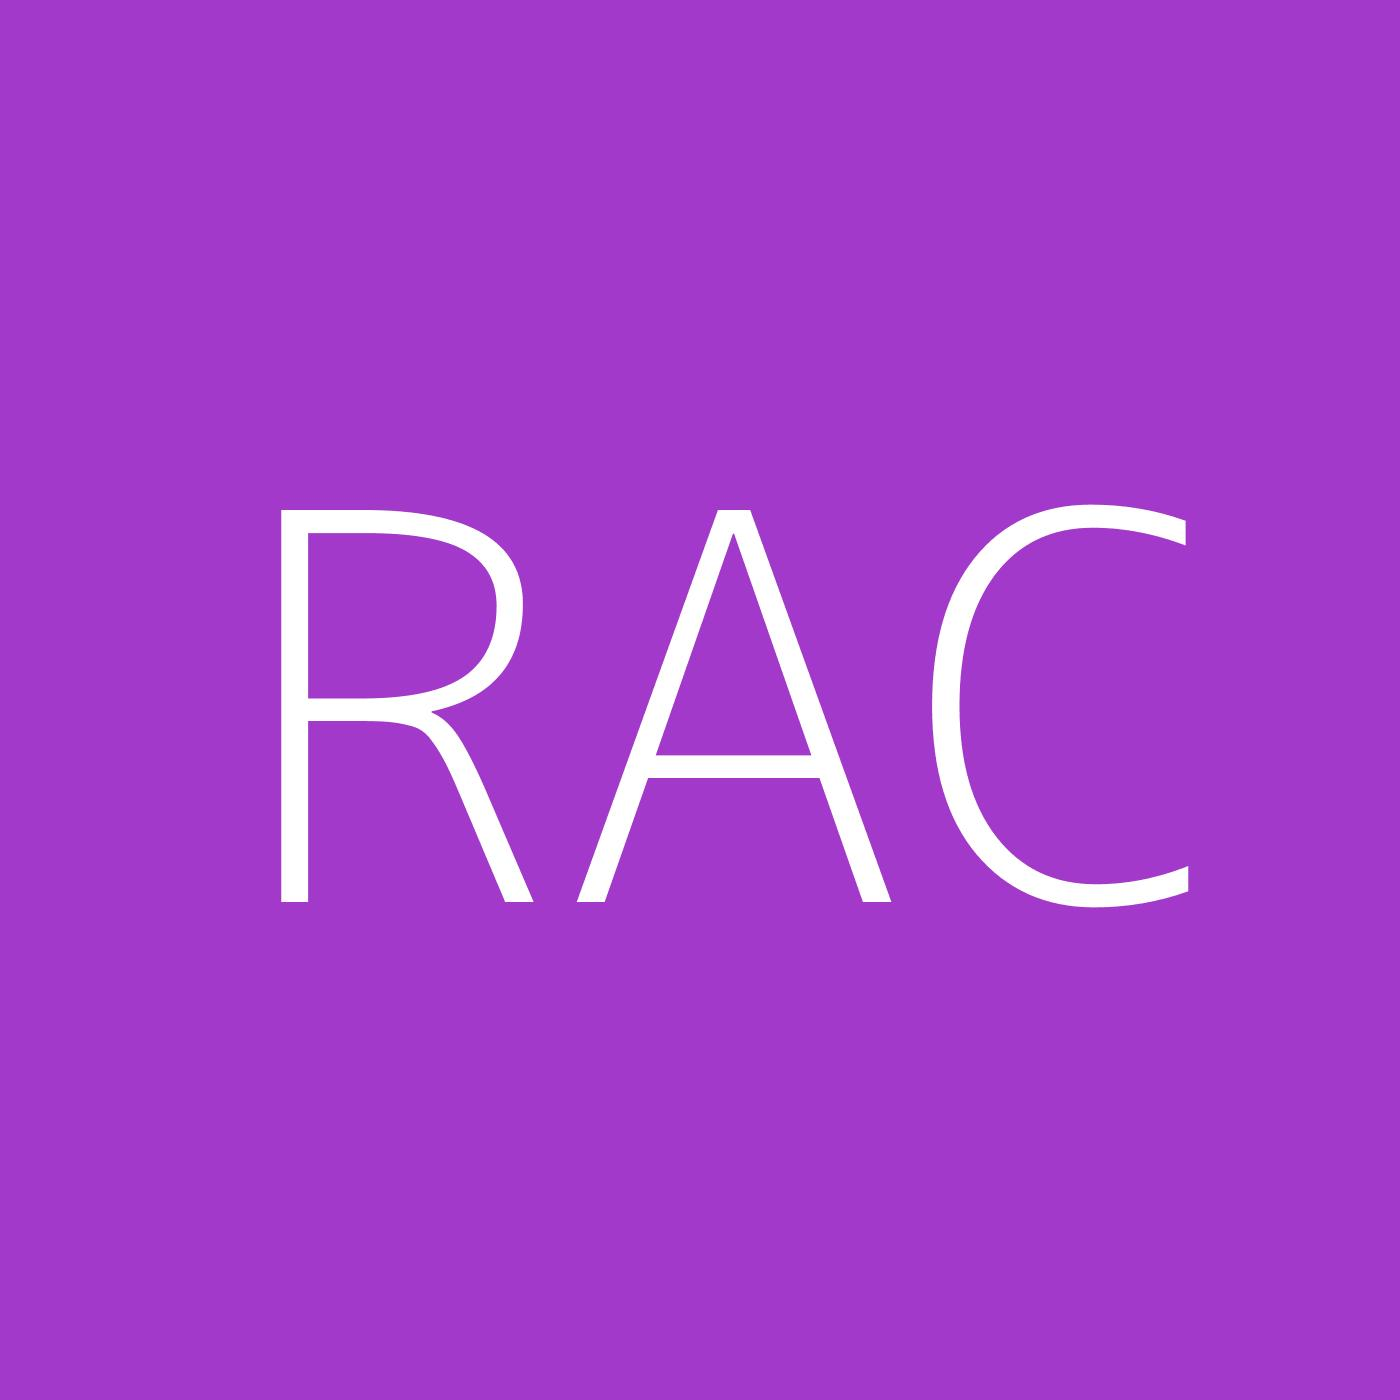 RAC Playlist Artwork